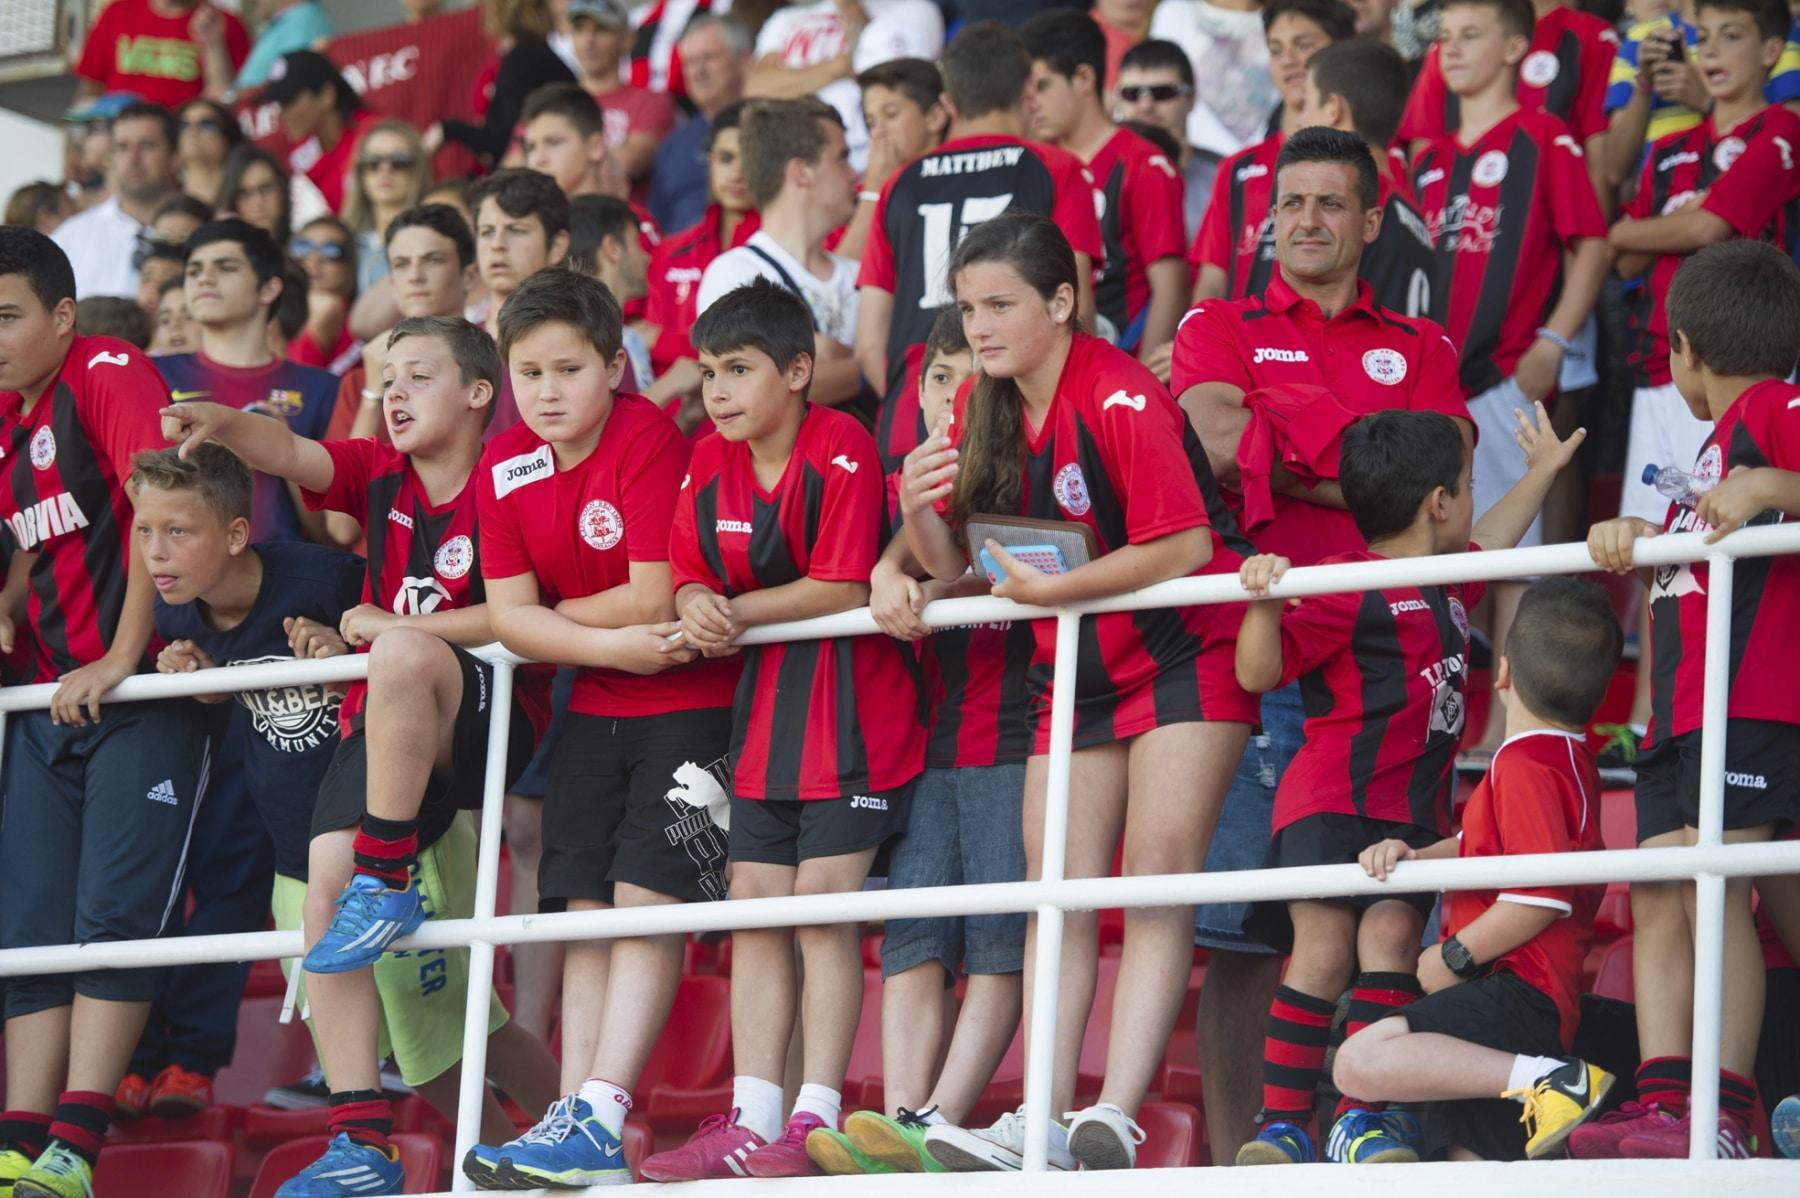 visita-platini-gibraltar-rock-cup-2014-23_13967053317_o